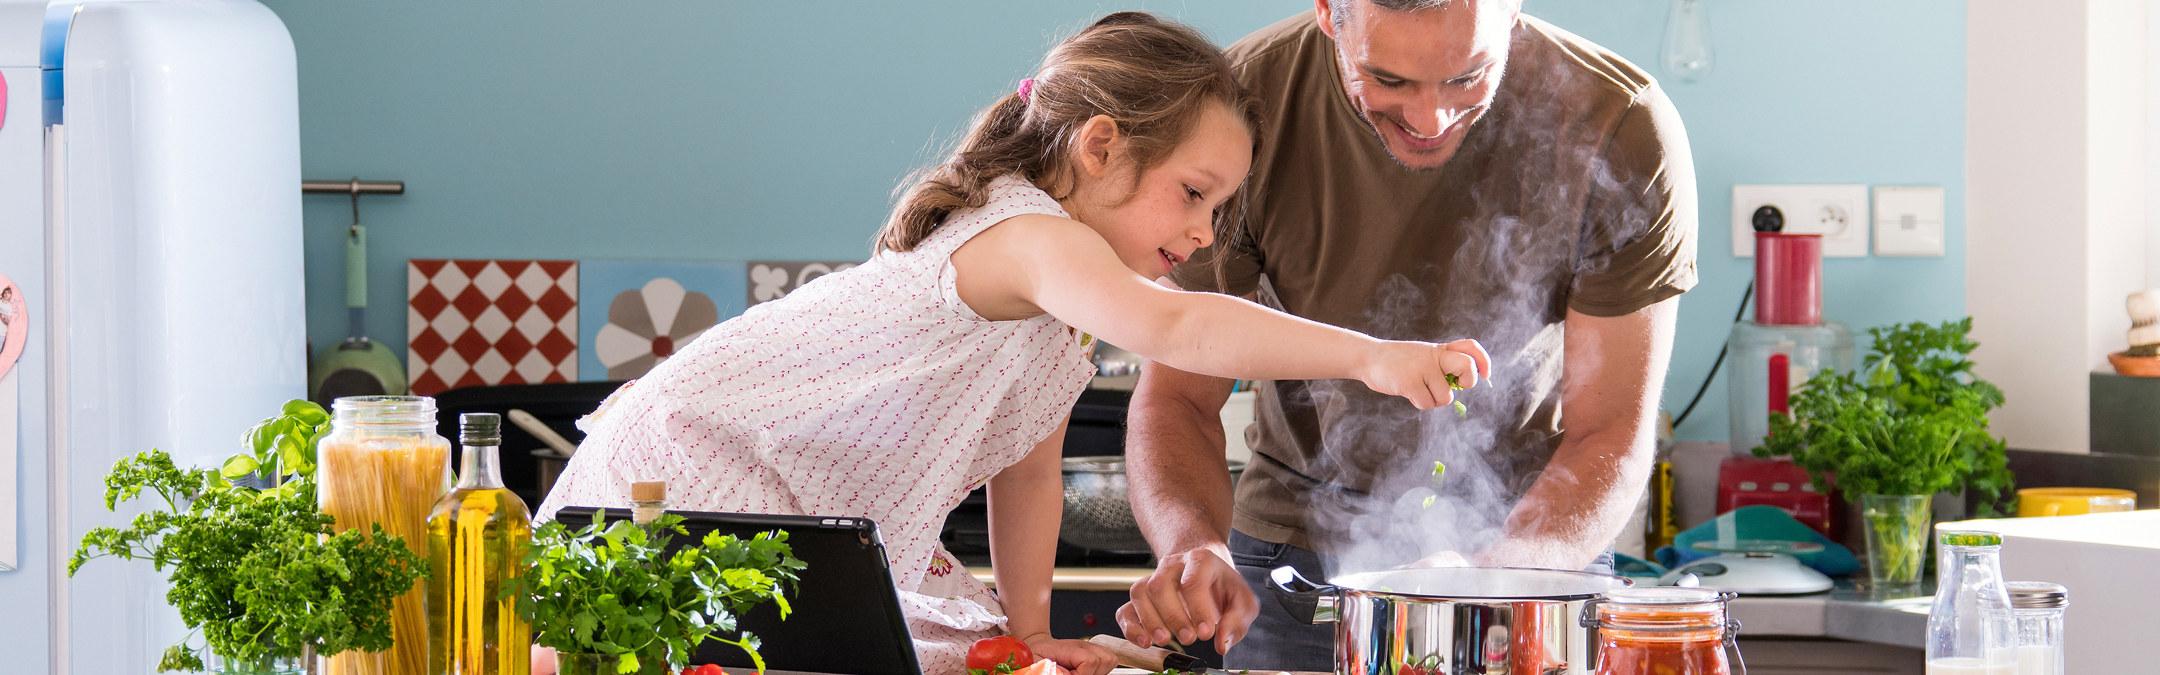 Datter og far lager middag. Foto